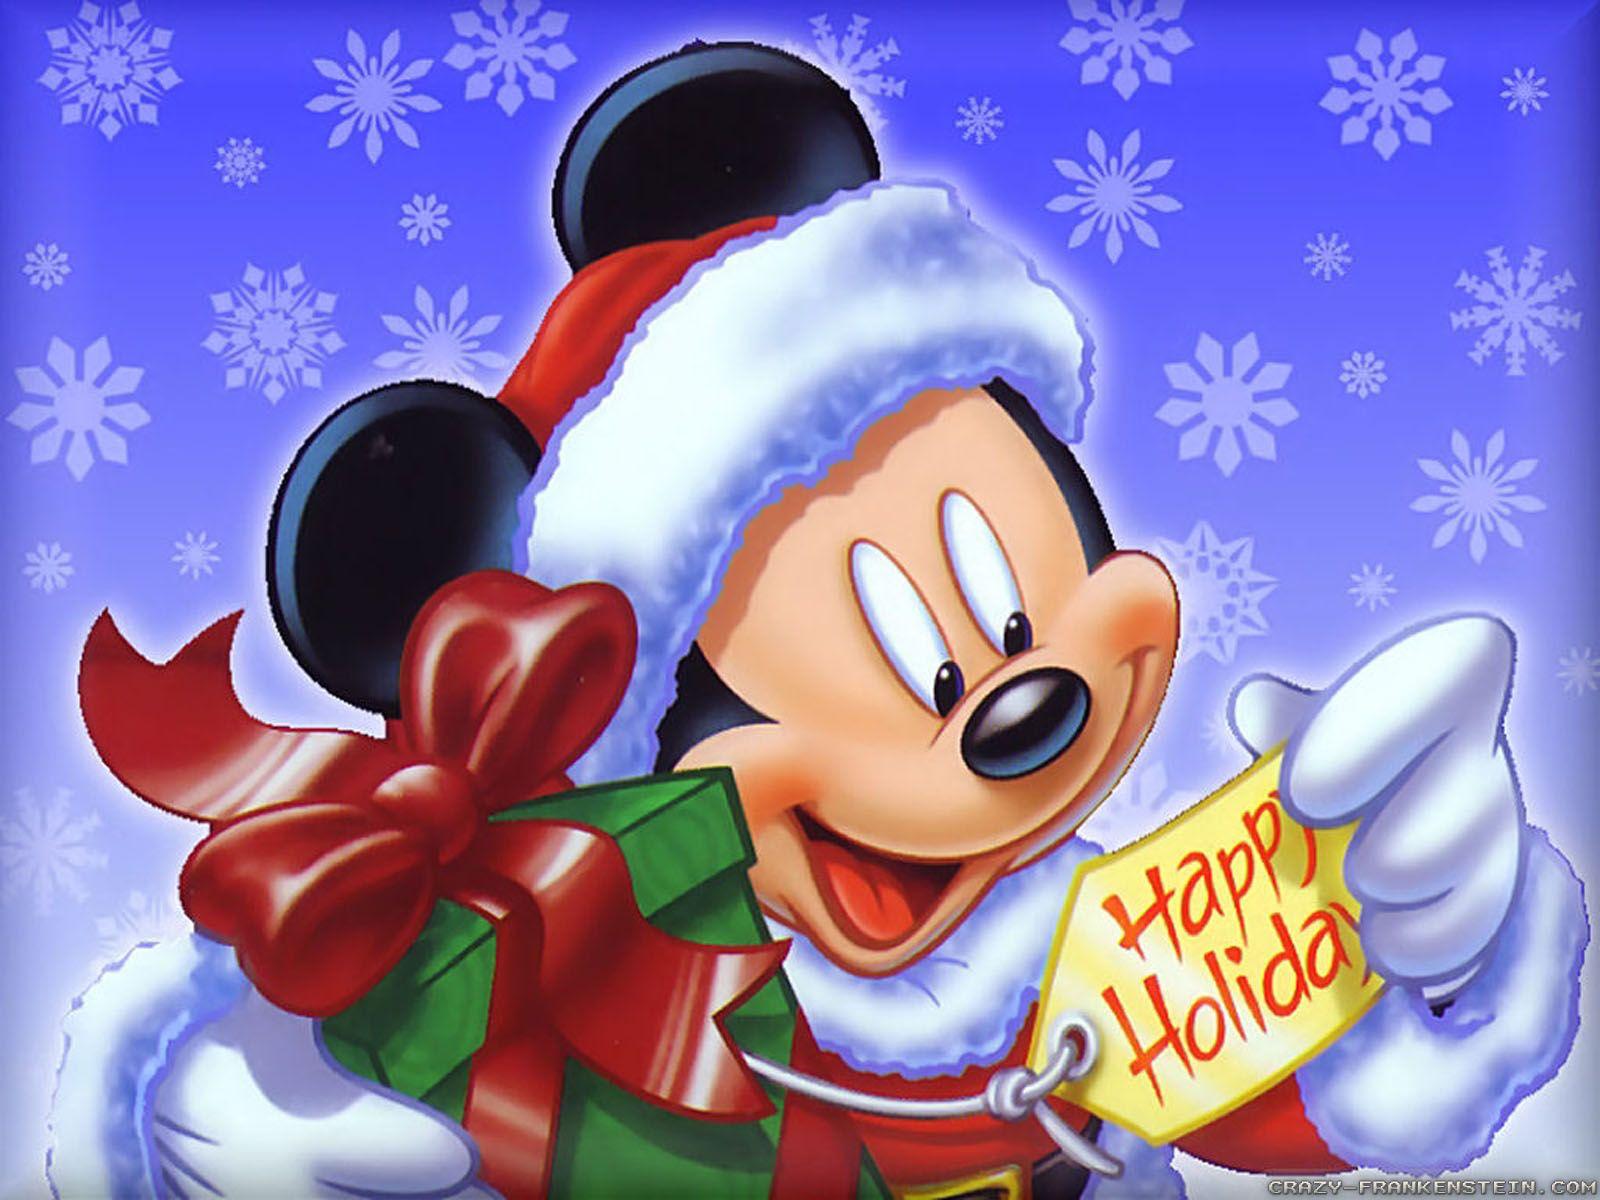 Wonderful Wallpaper Christmas Mickey Mouse - f02ae3848470955f676bd6c1868e3714  Trends_346861 .jpg